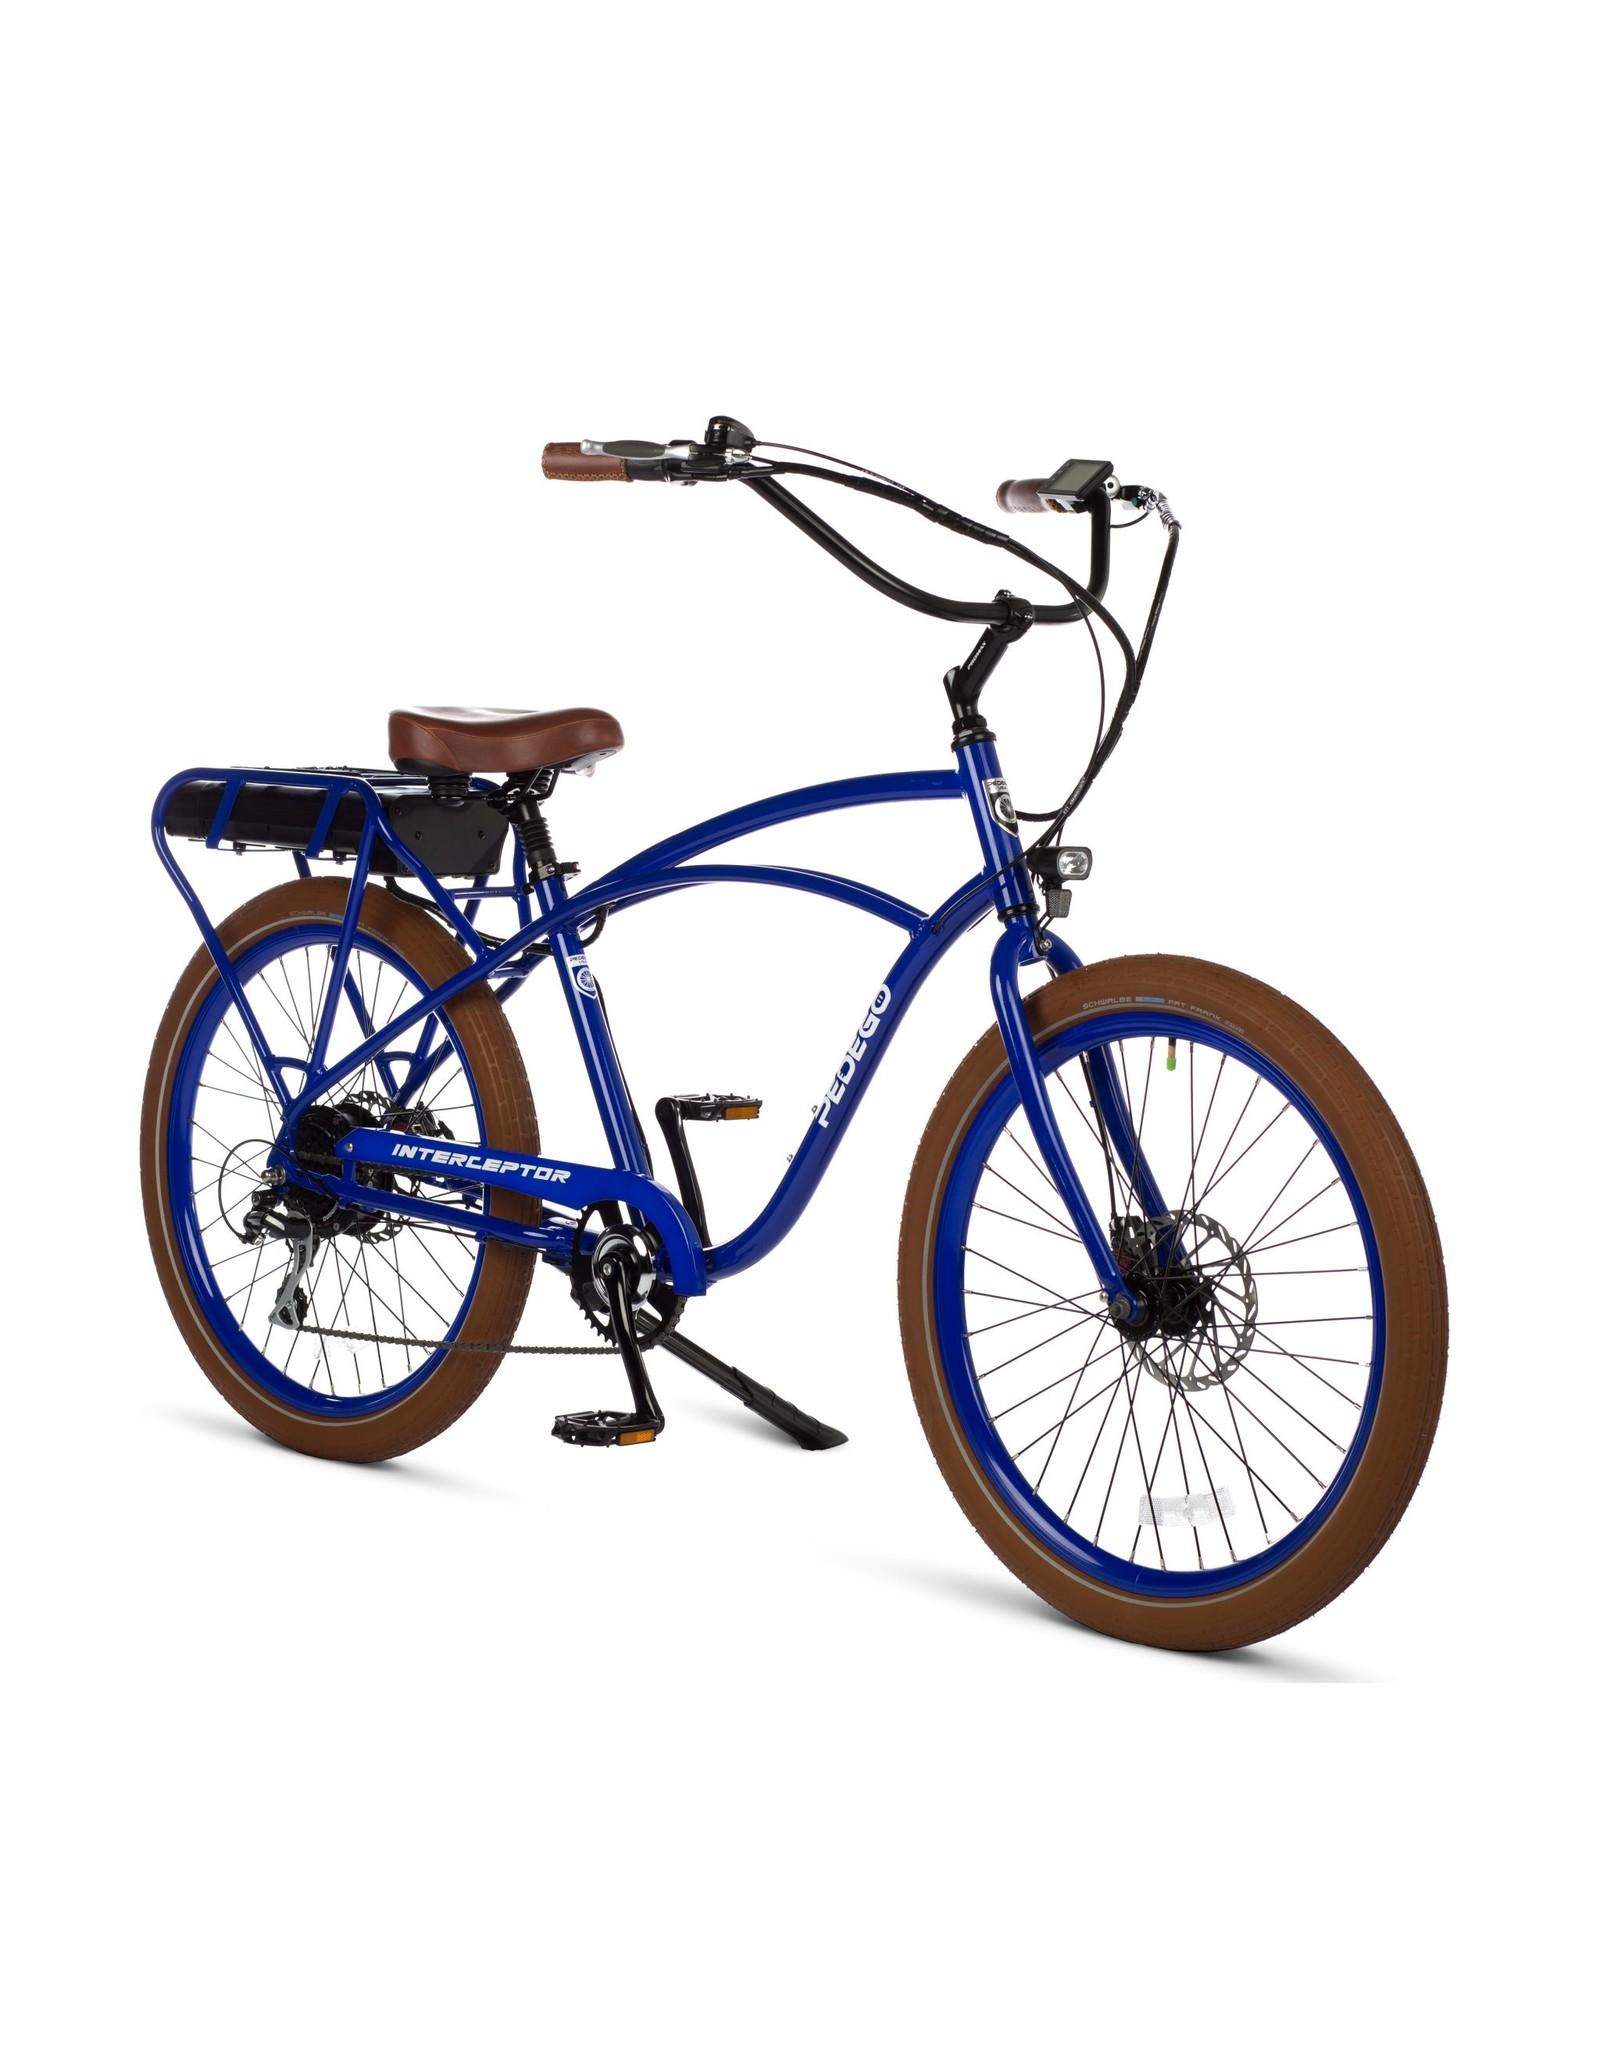 Pedego Electric Bikes Interceptor Classic (Used)